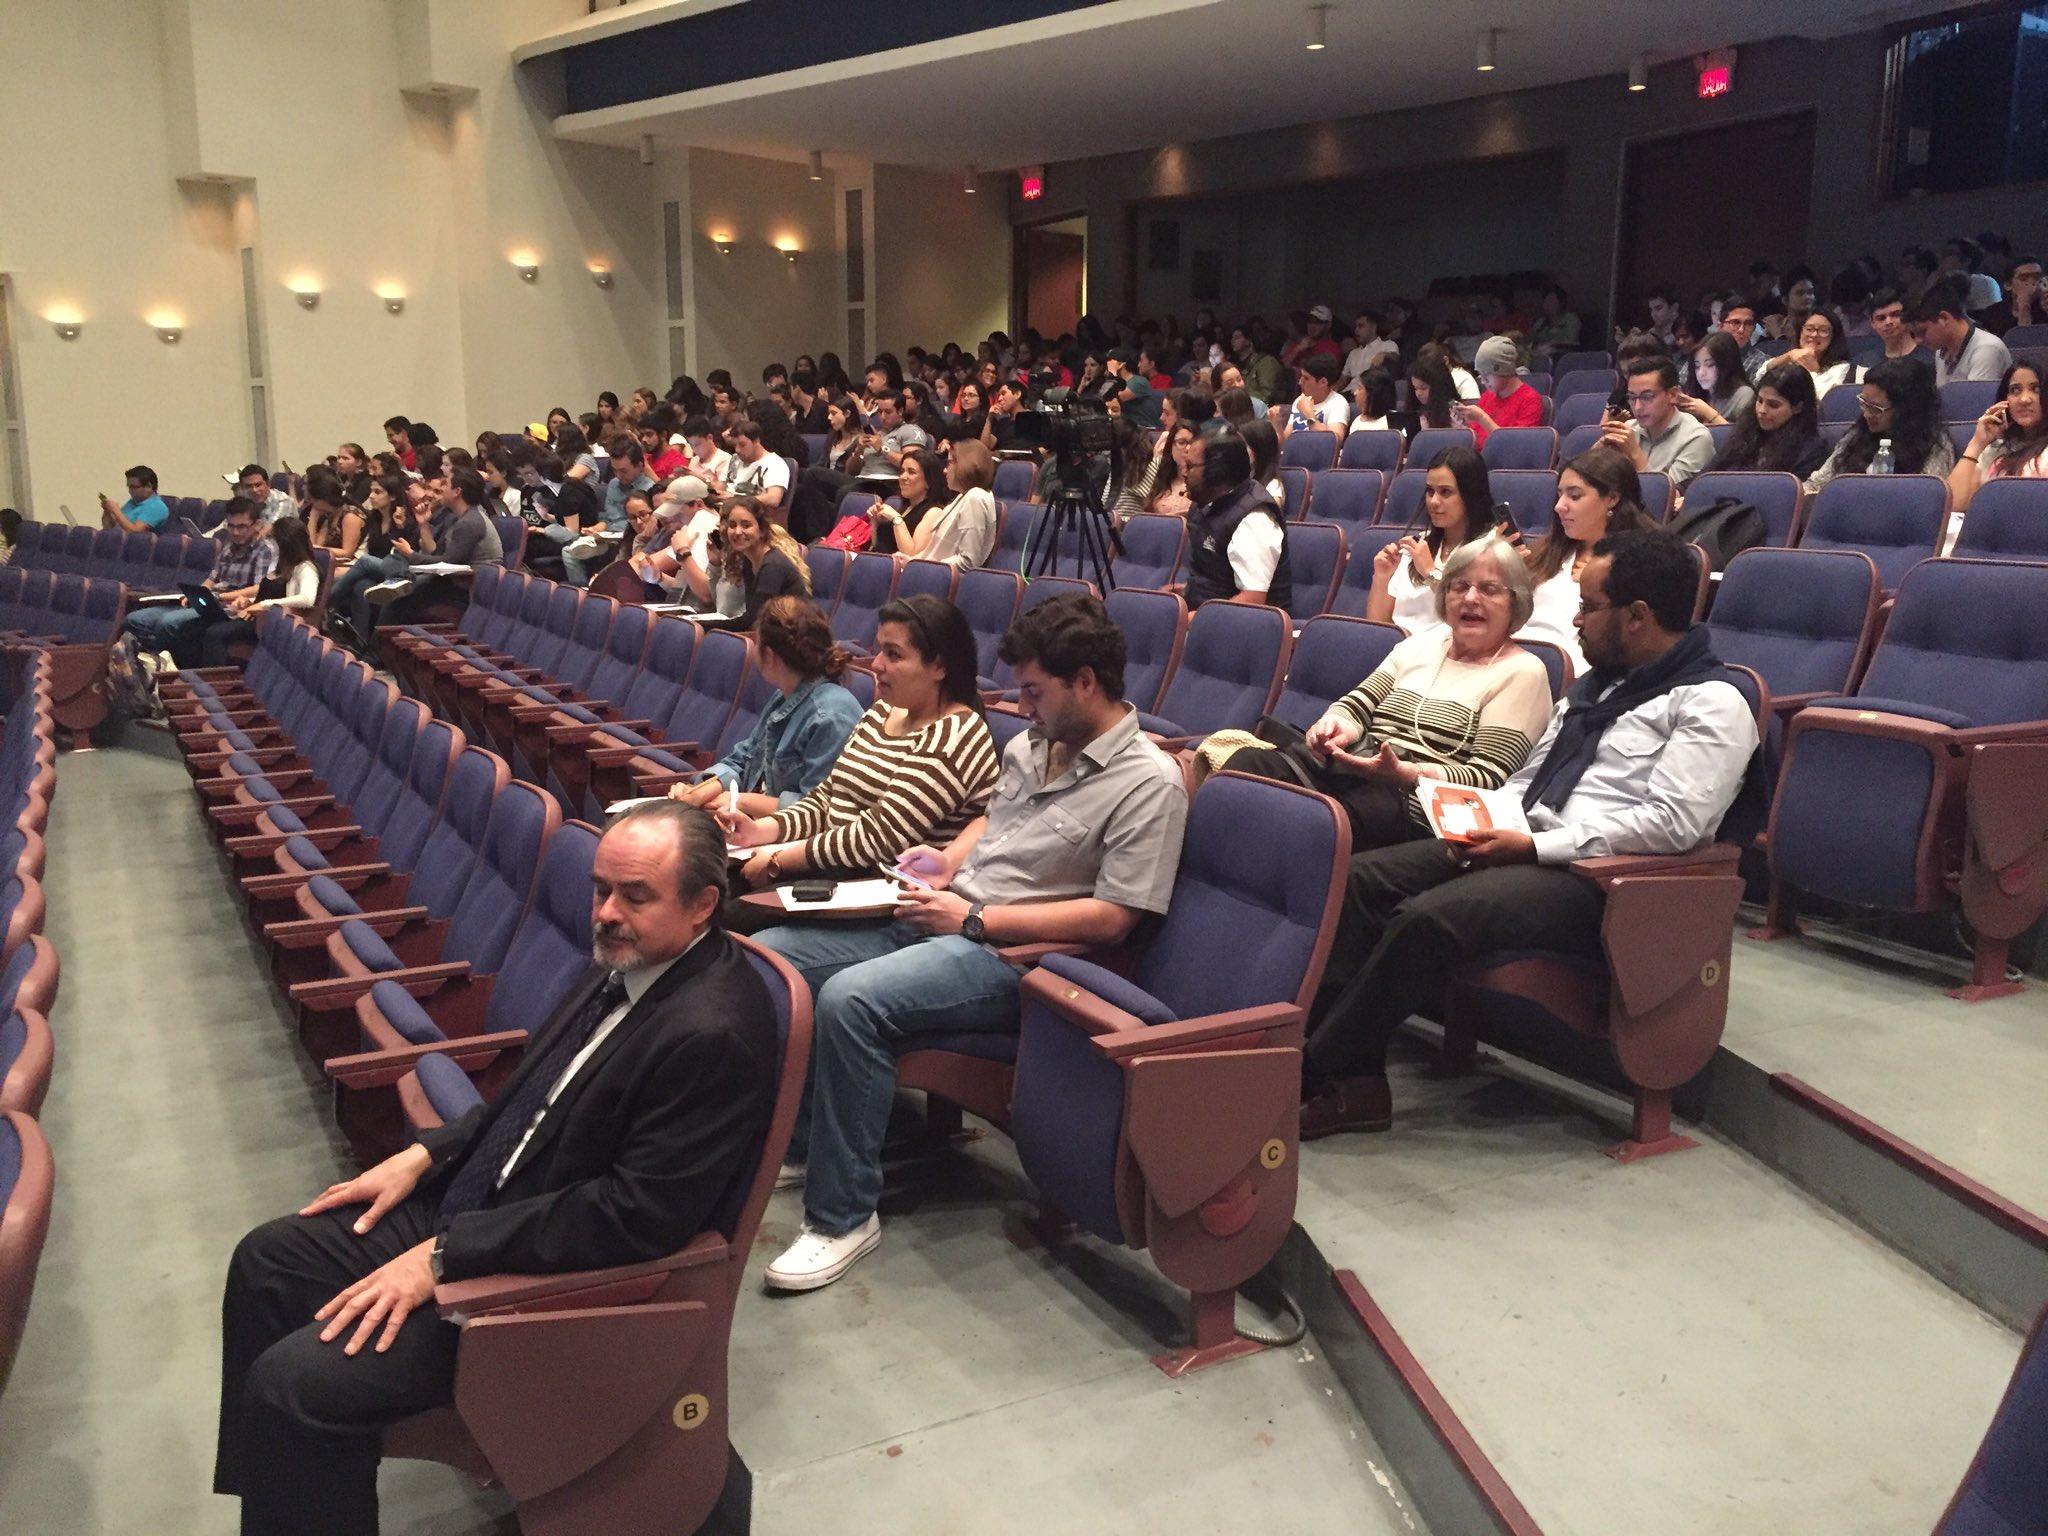 Entre el público @WOrbaugh en la conferencia de @yoanisanchez #YoaniUfm https://t.co/LNSn2mqJrl